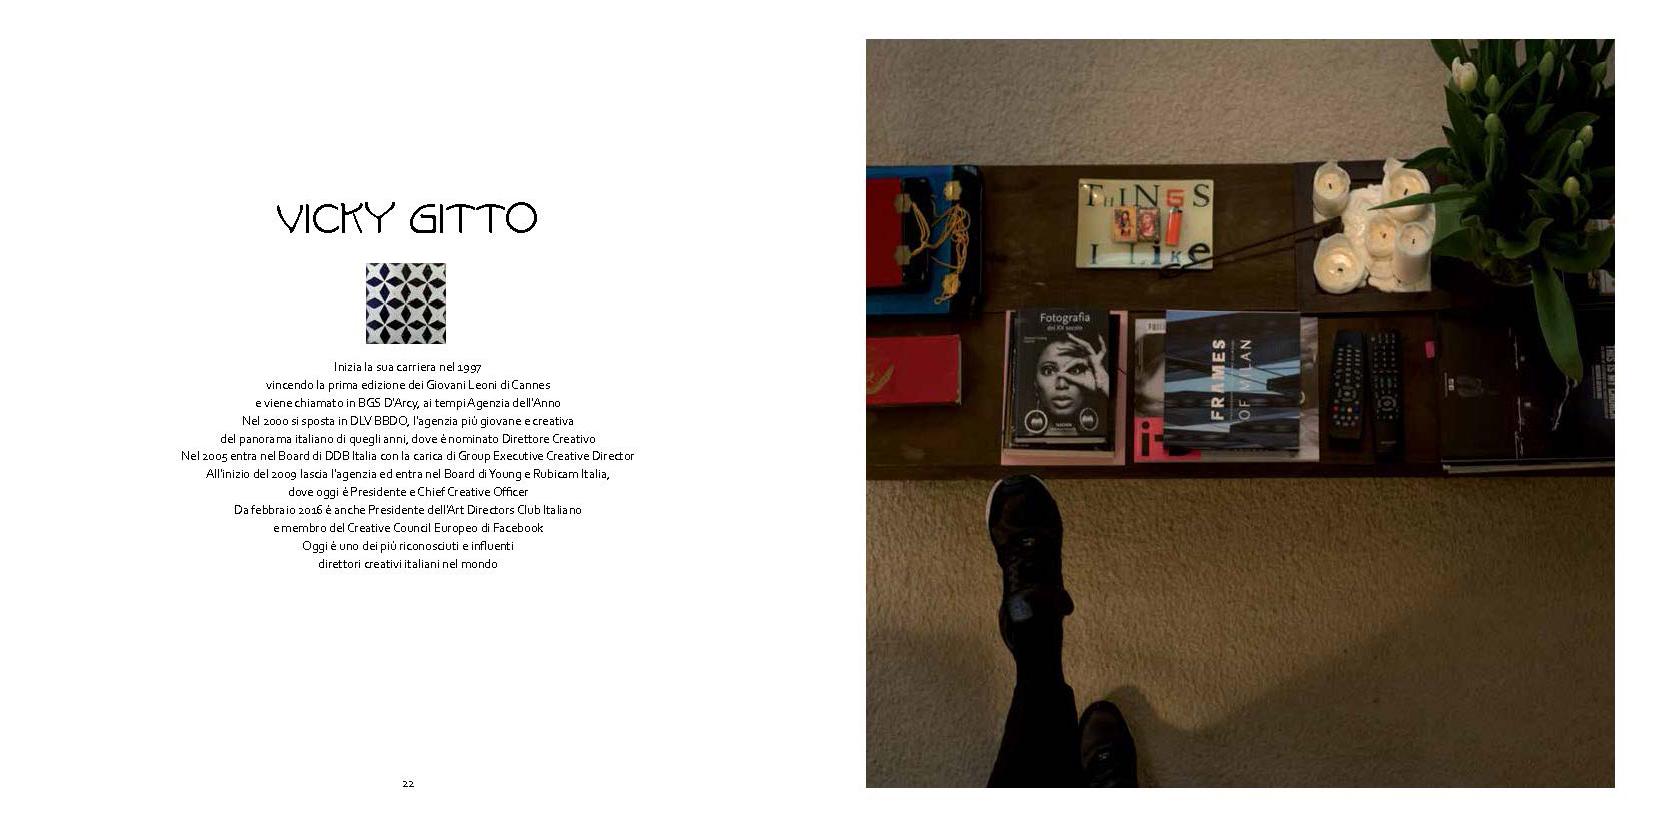 Vicky Gitto-ArtDirector-PresidenteY&R 01